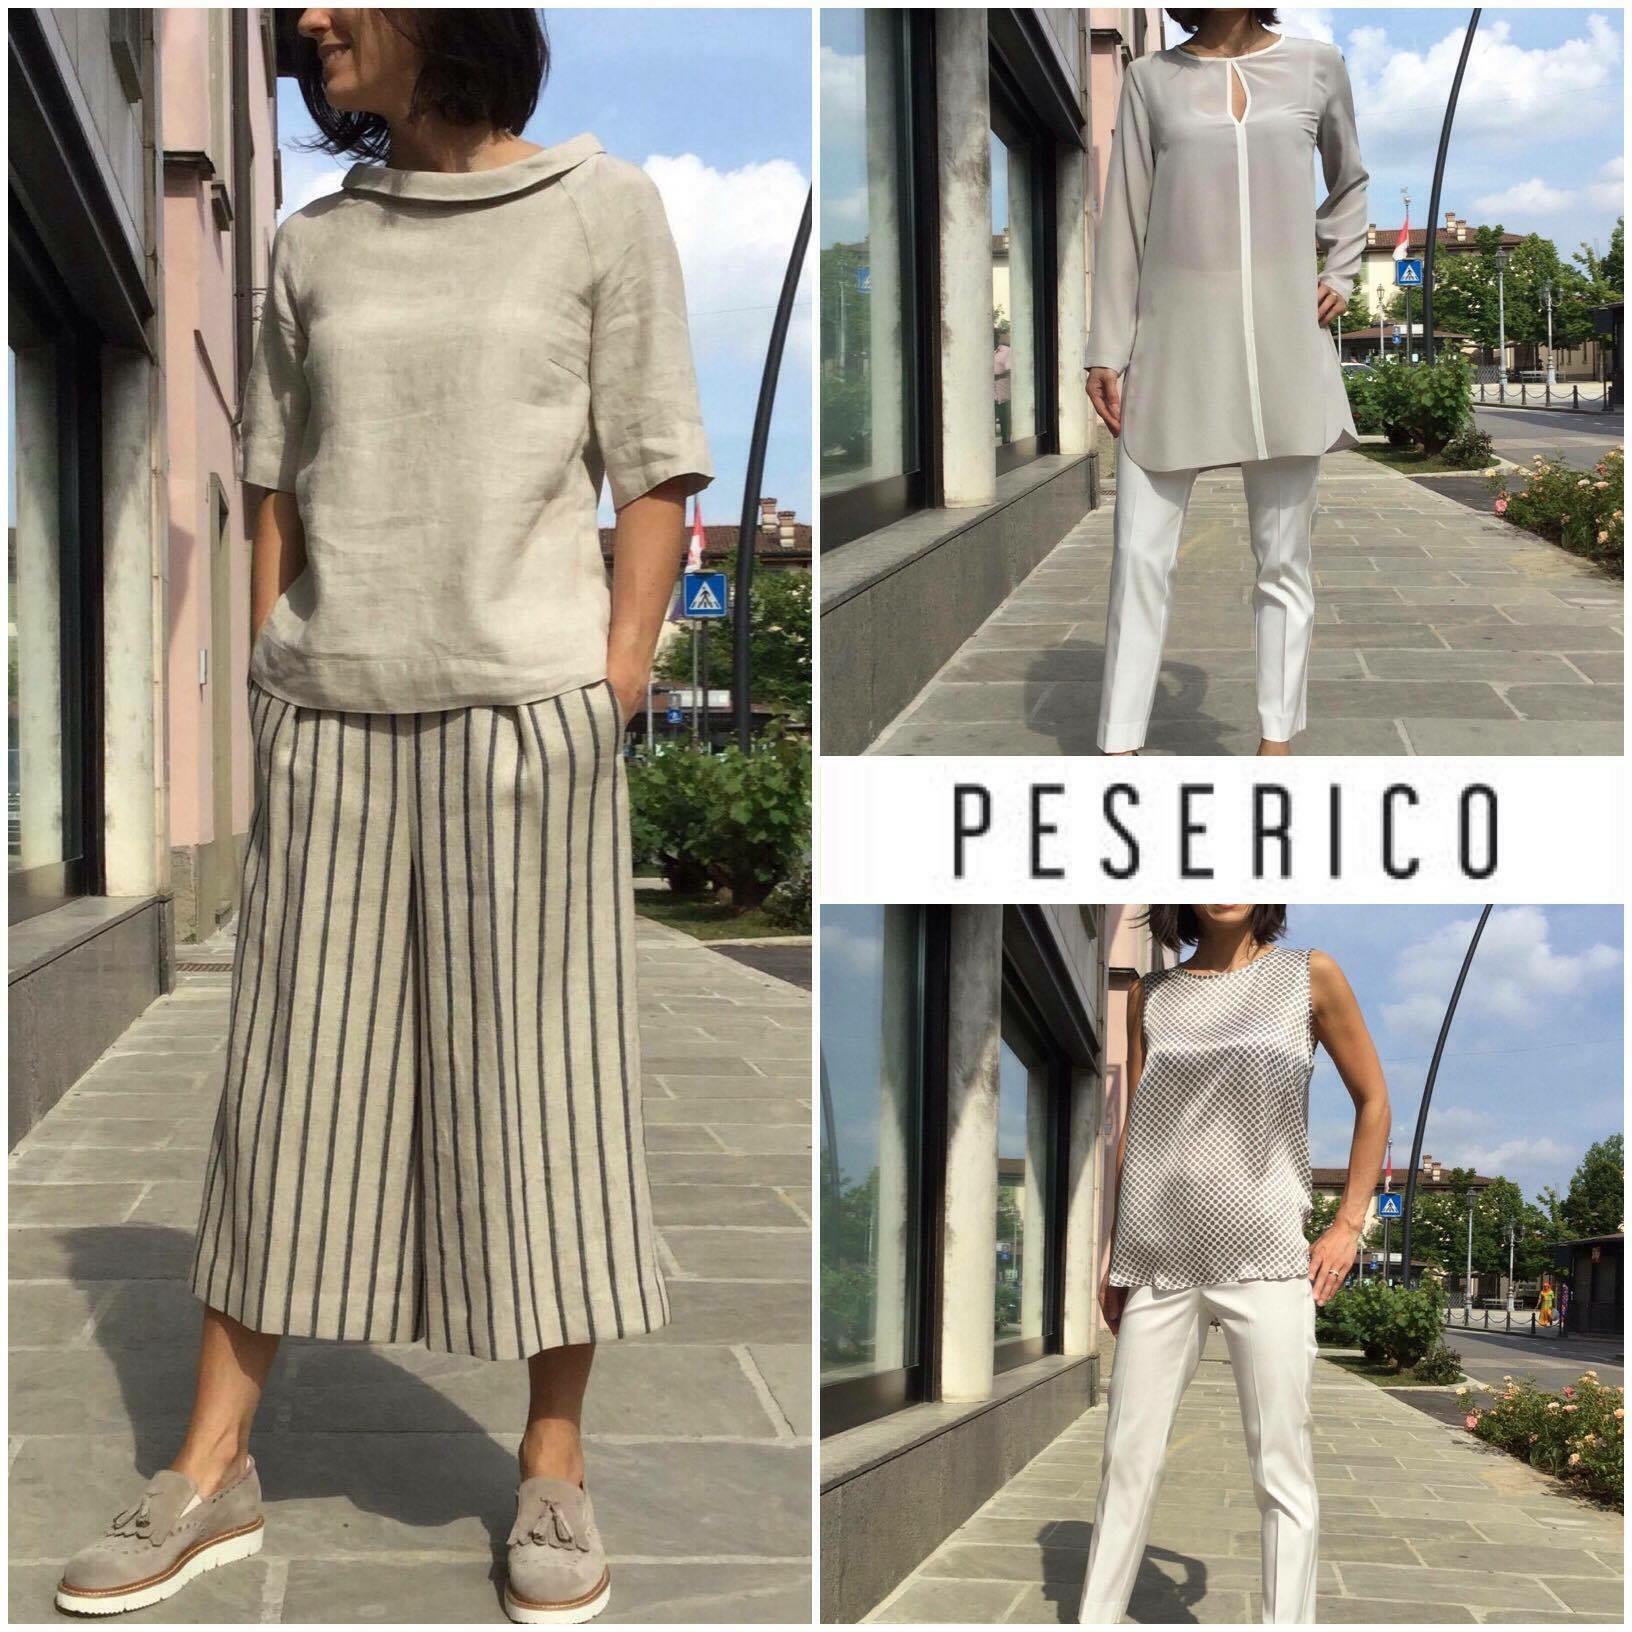 Peserico: Il Made In Italy Al Femminile